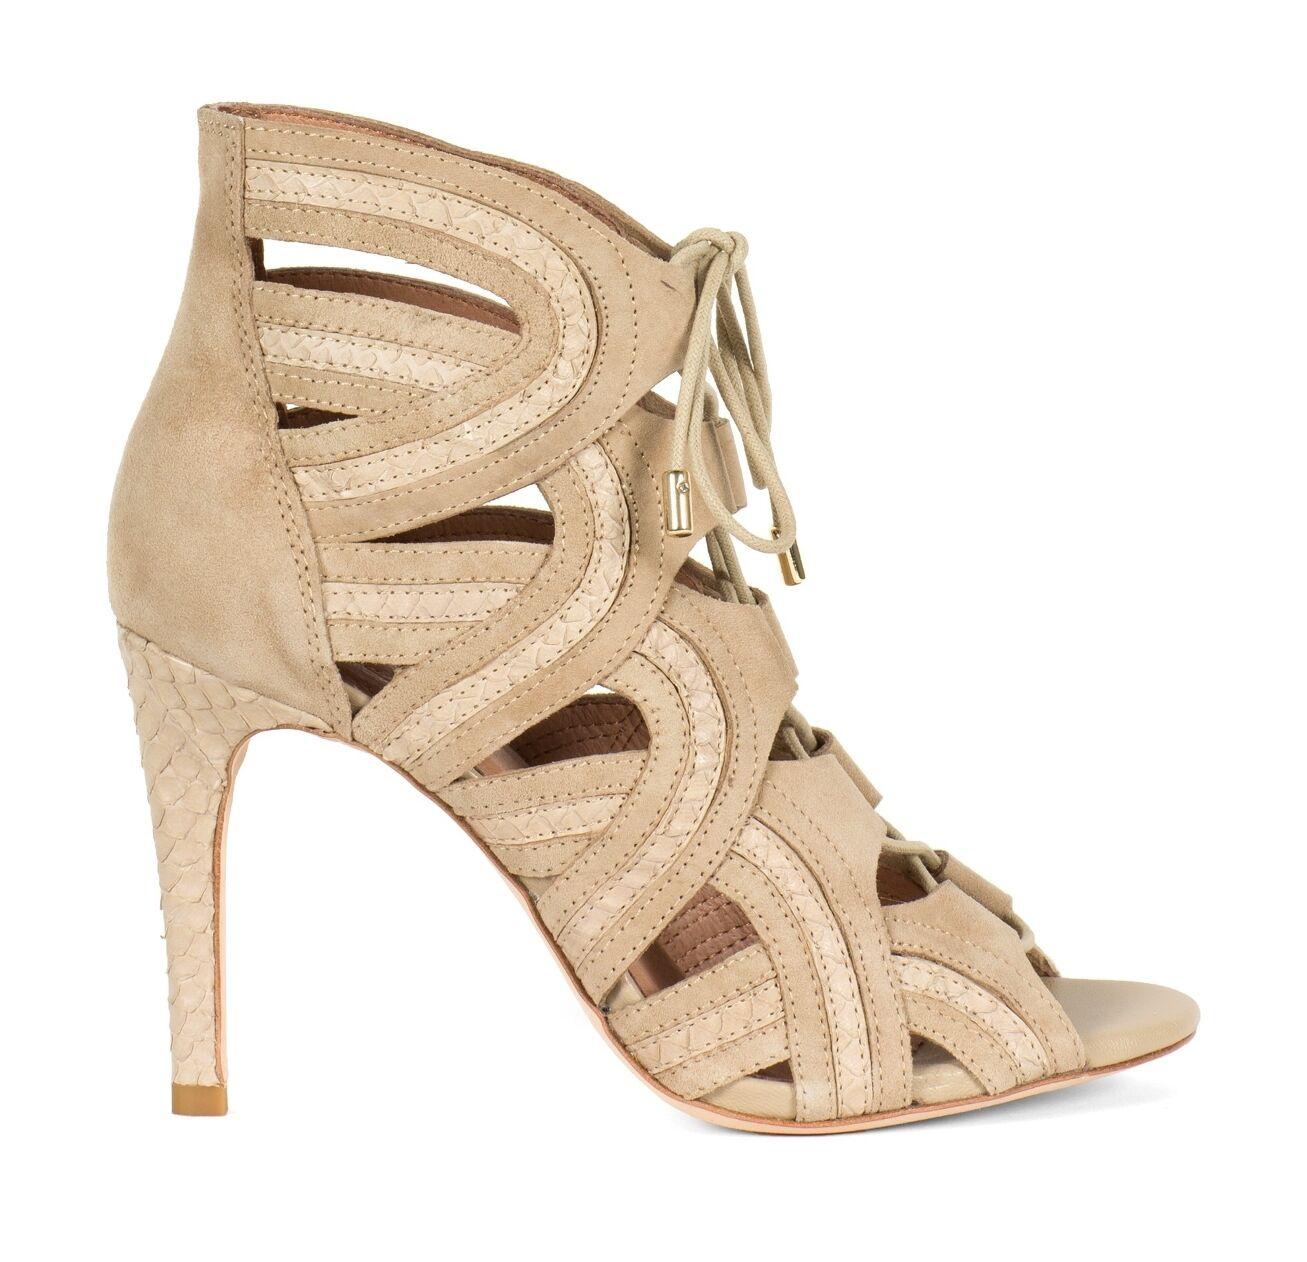 New Joie Dean Caged Gladiator Sandals Heels, Nude Suede Snakeskin, Snakeskin, Snakeskin, sz 8 (38 EUR) 15bbf2